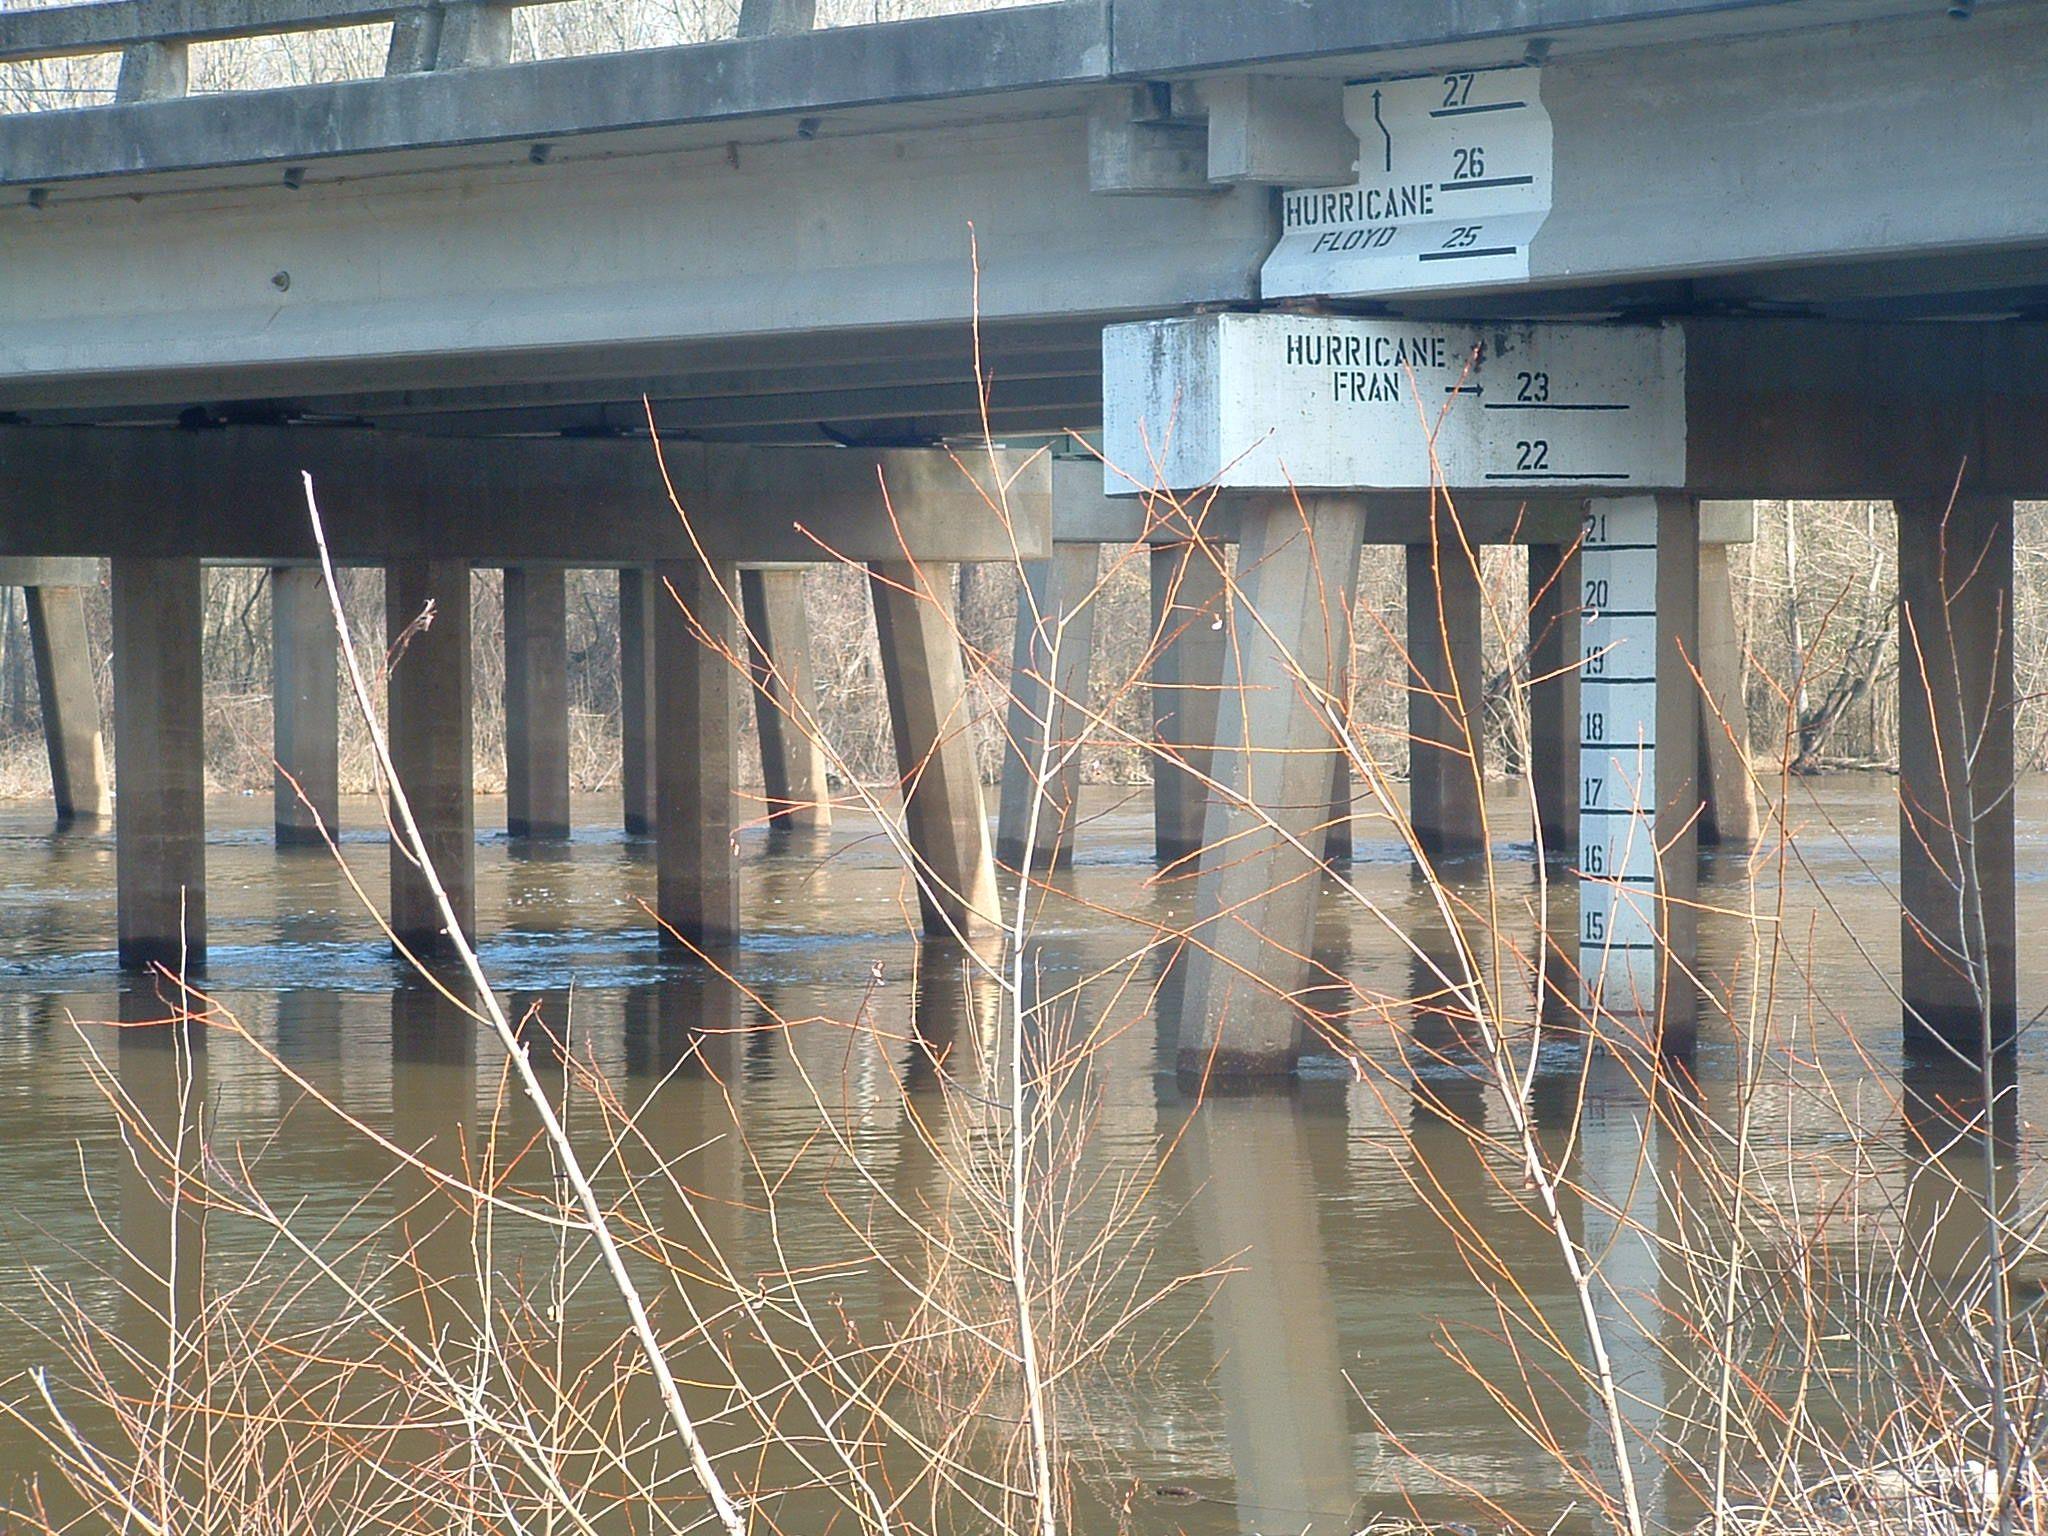 kinston nc bridge on the neuse river before we paddle miles kinston nc bridge on the neuse river before we paddle 60 miles to new